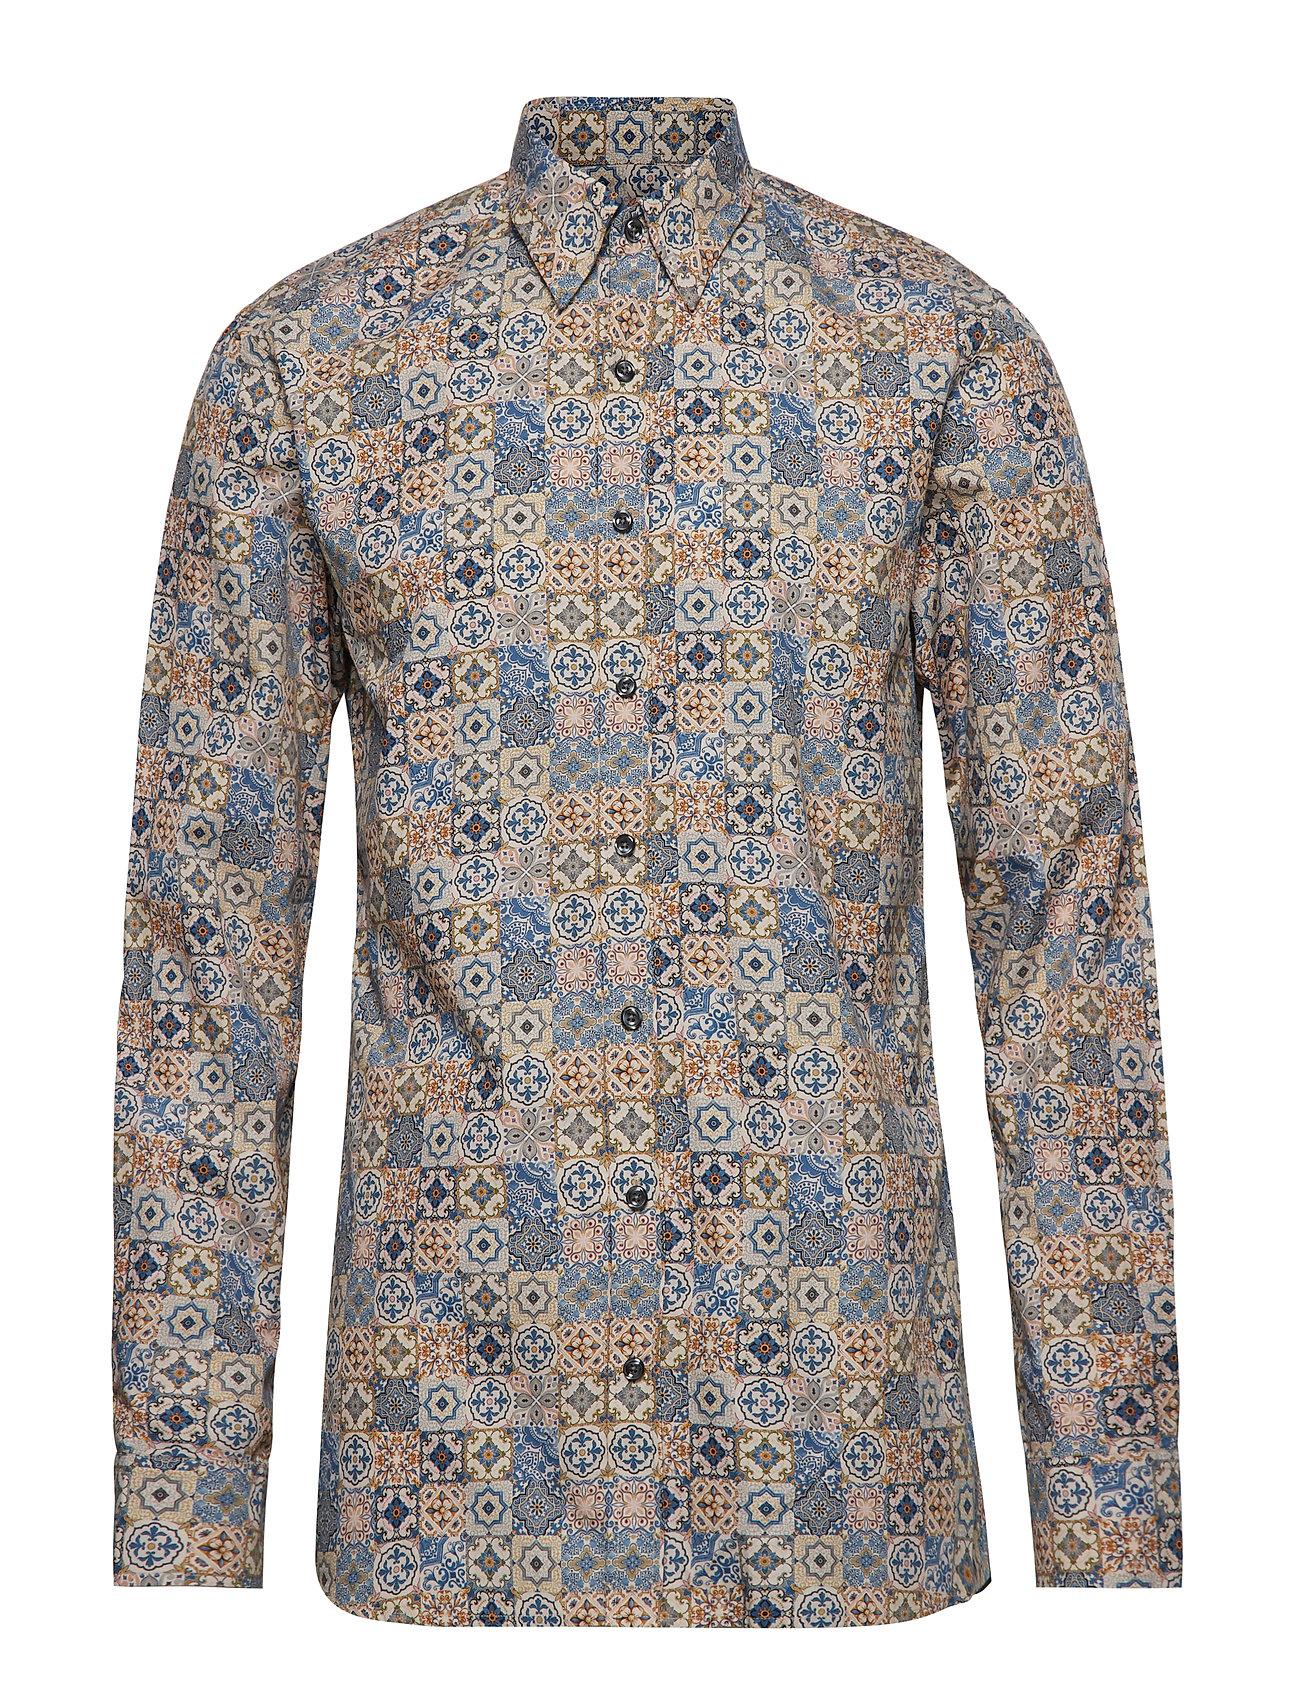 Oscar Jacobson Henning 2 slim shirt wash - 273 - CLOUDY BLUE